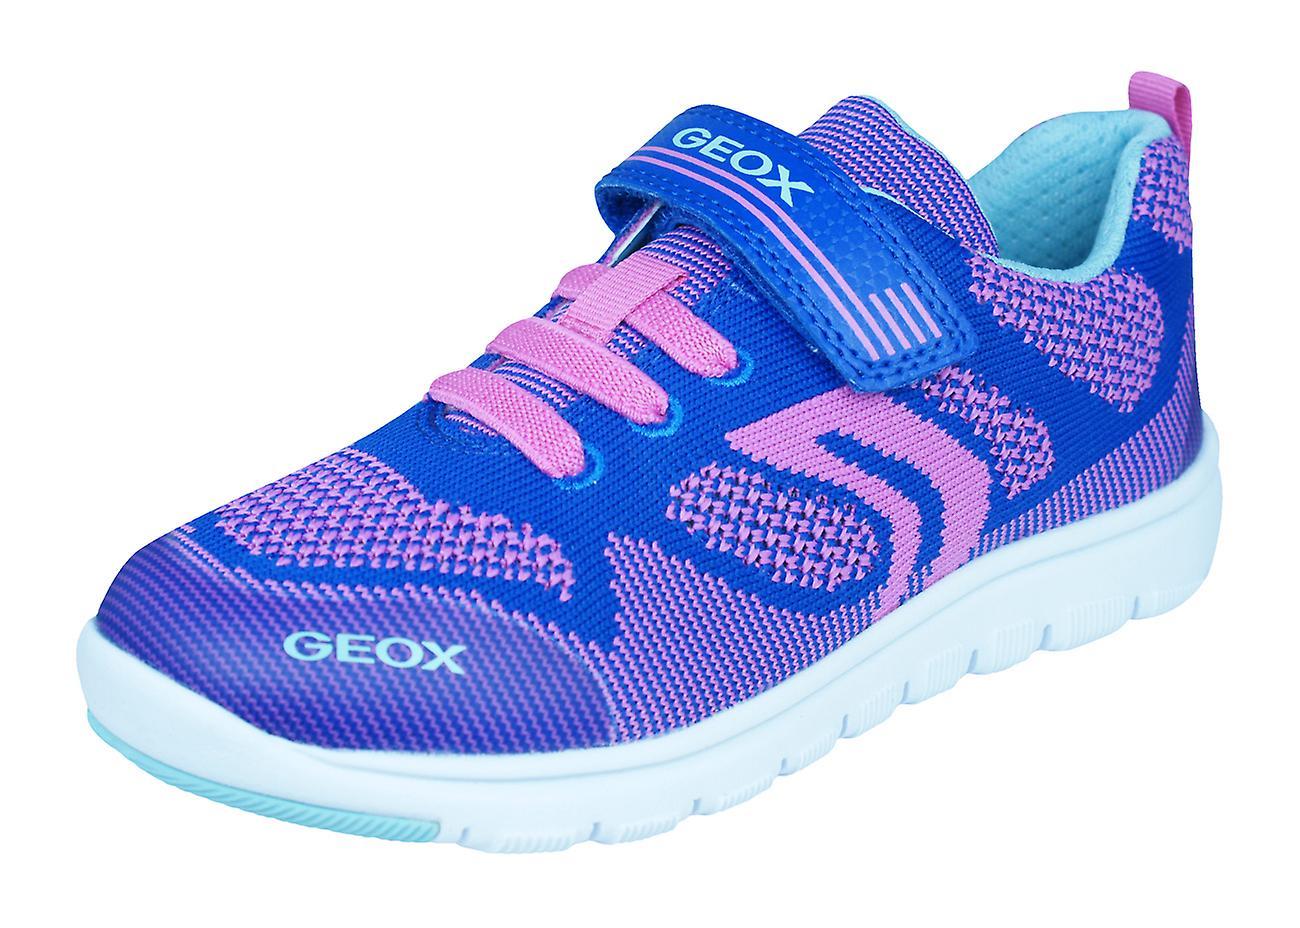 Geox J Xunday G.B. Girls Trainers   scarpe - blu and Fuchsia   Qualità primaria    Uomo/Donna Scarpa